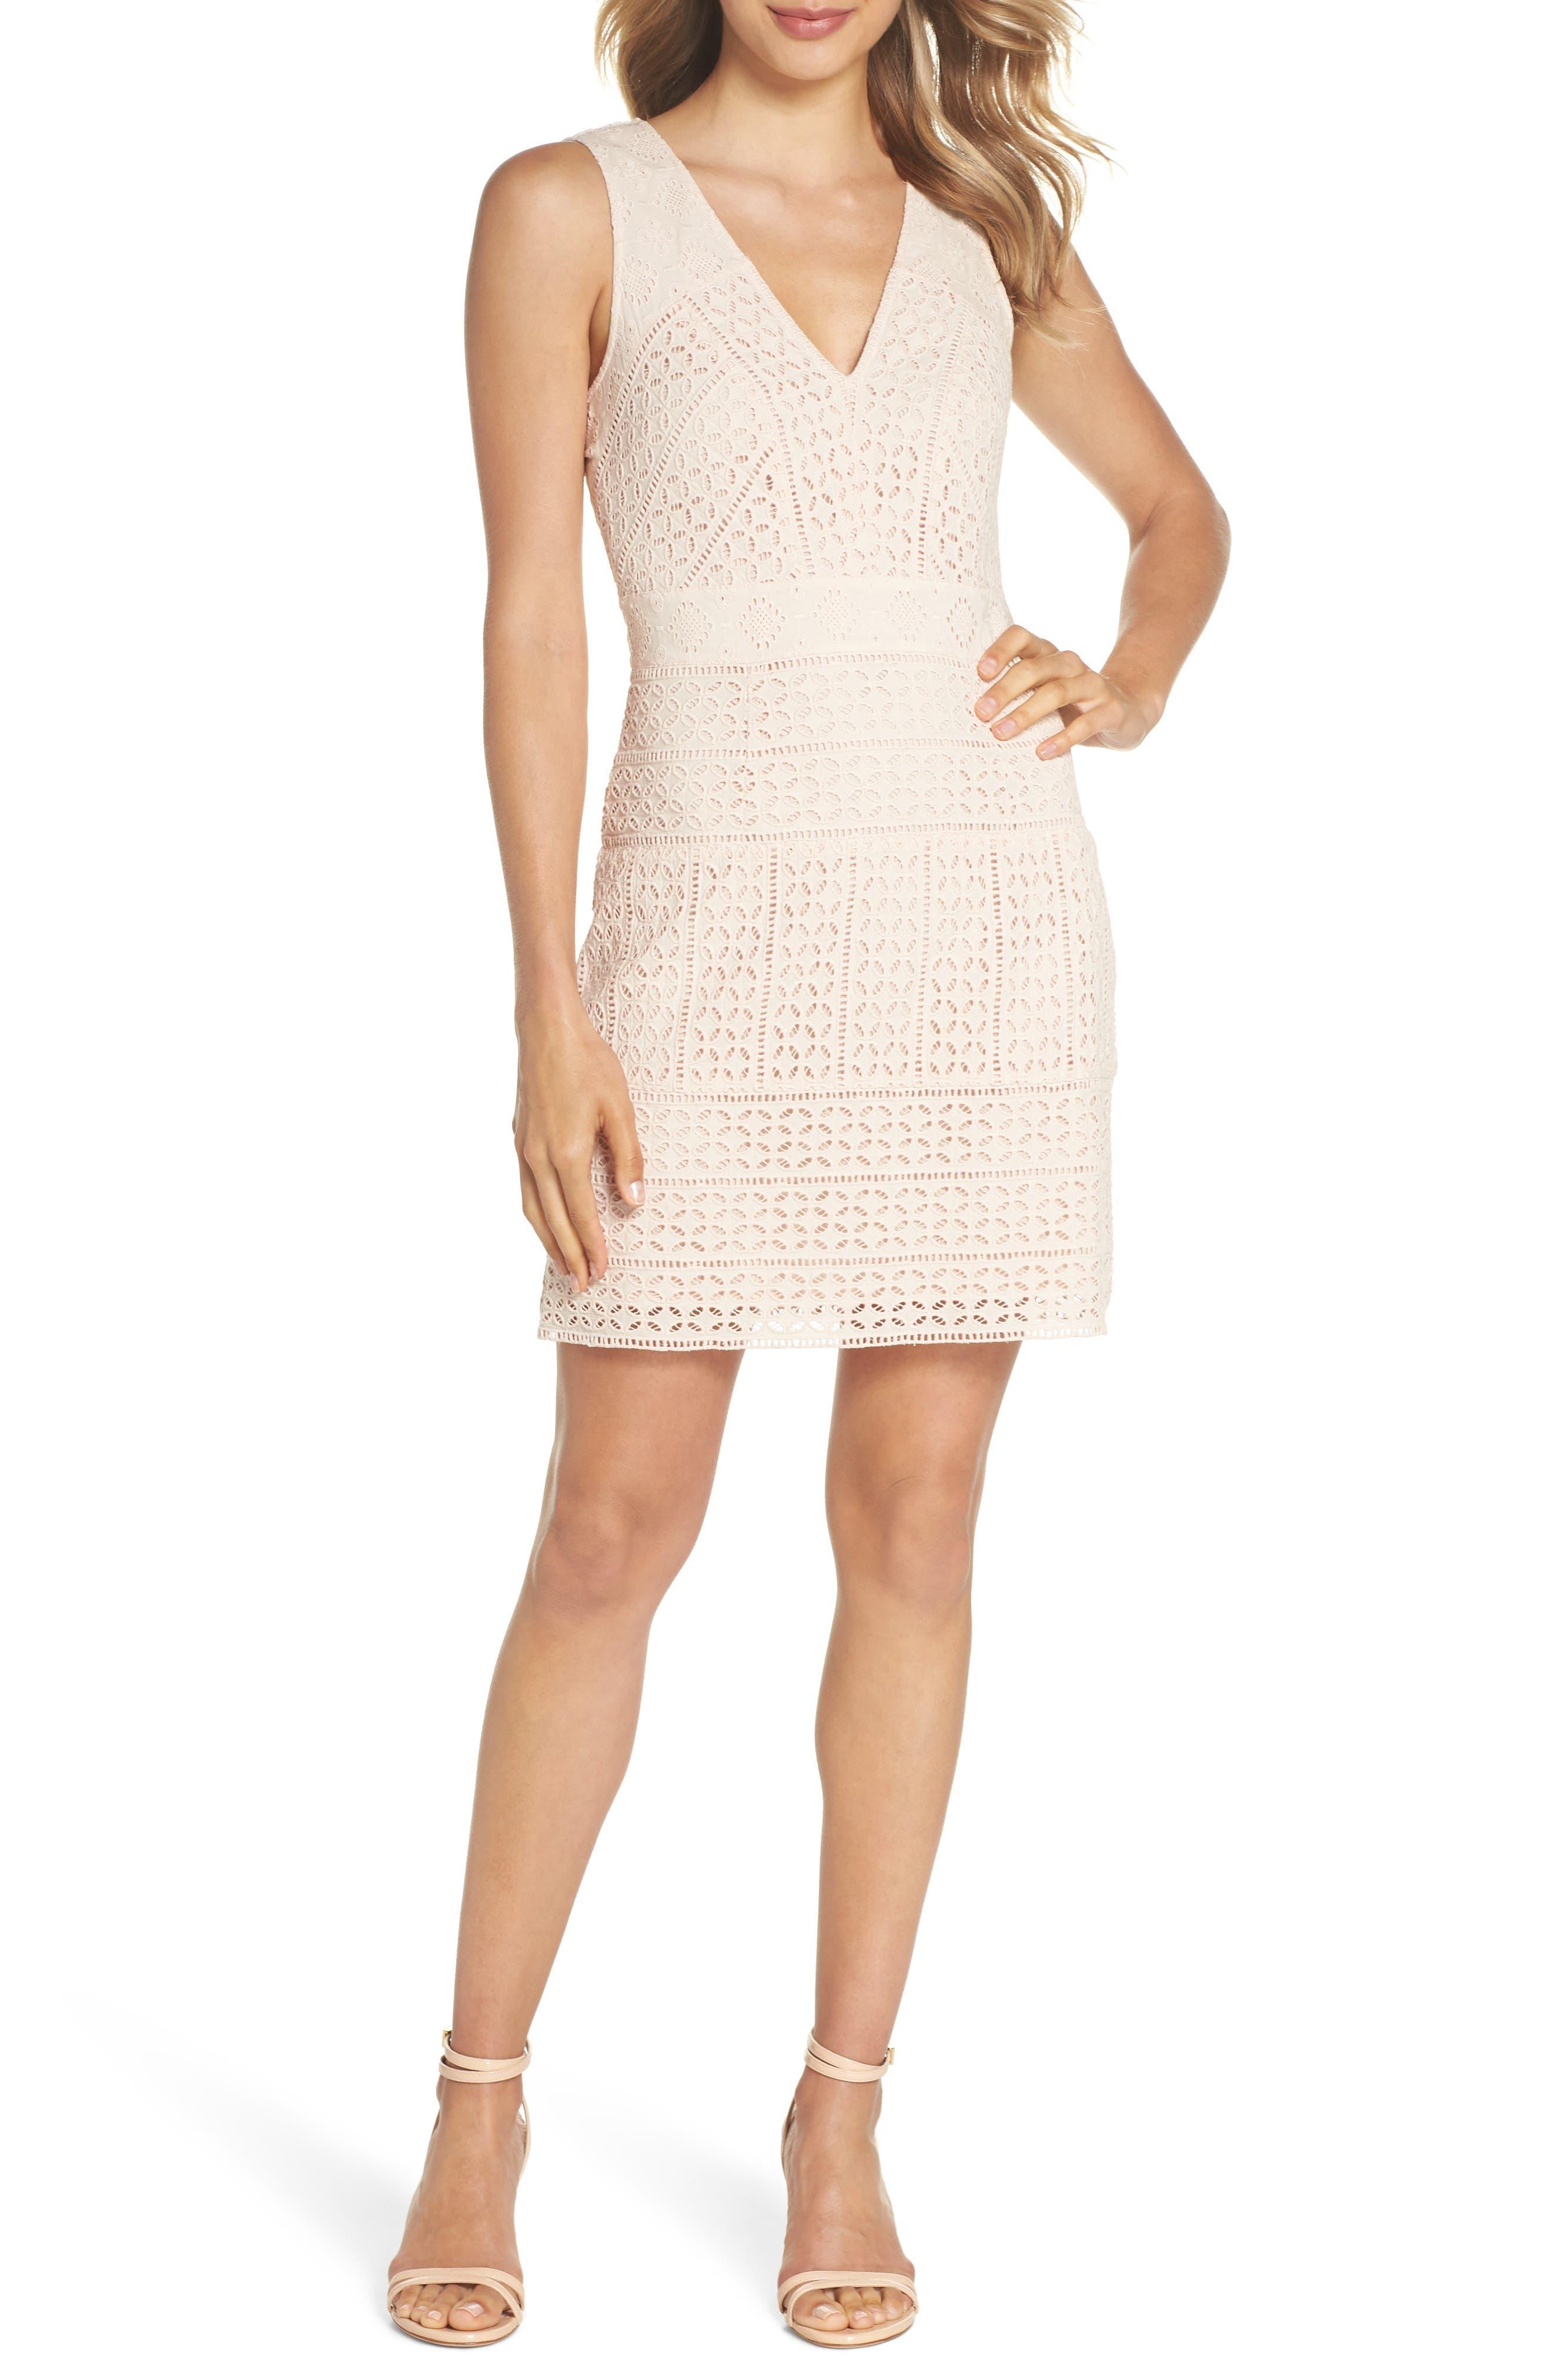 Schiffley Summer Cage Cotton Dress, Main, color, 687